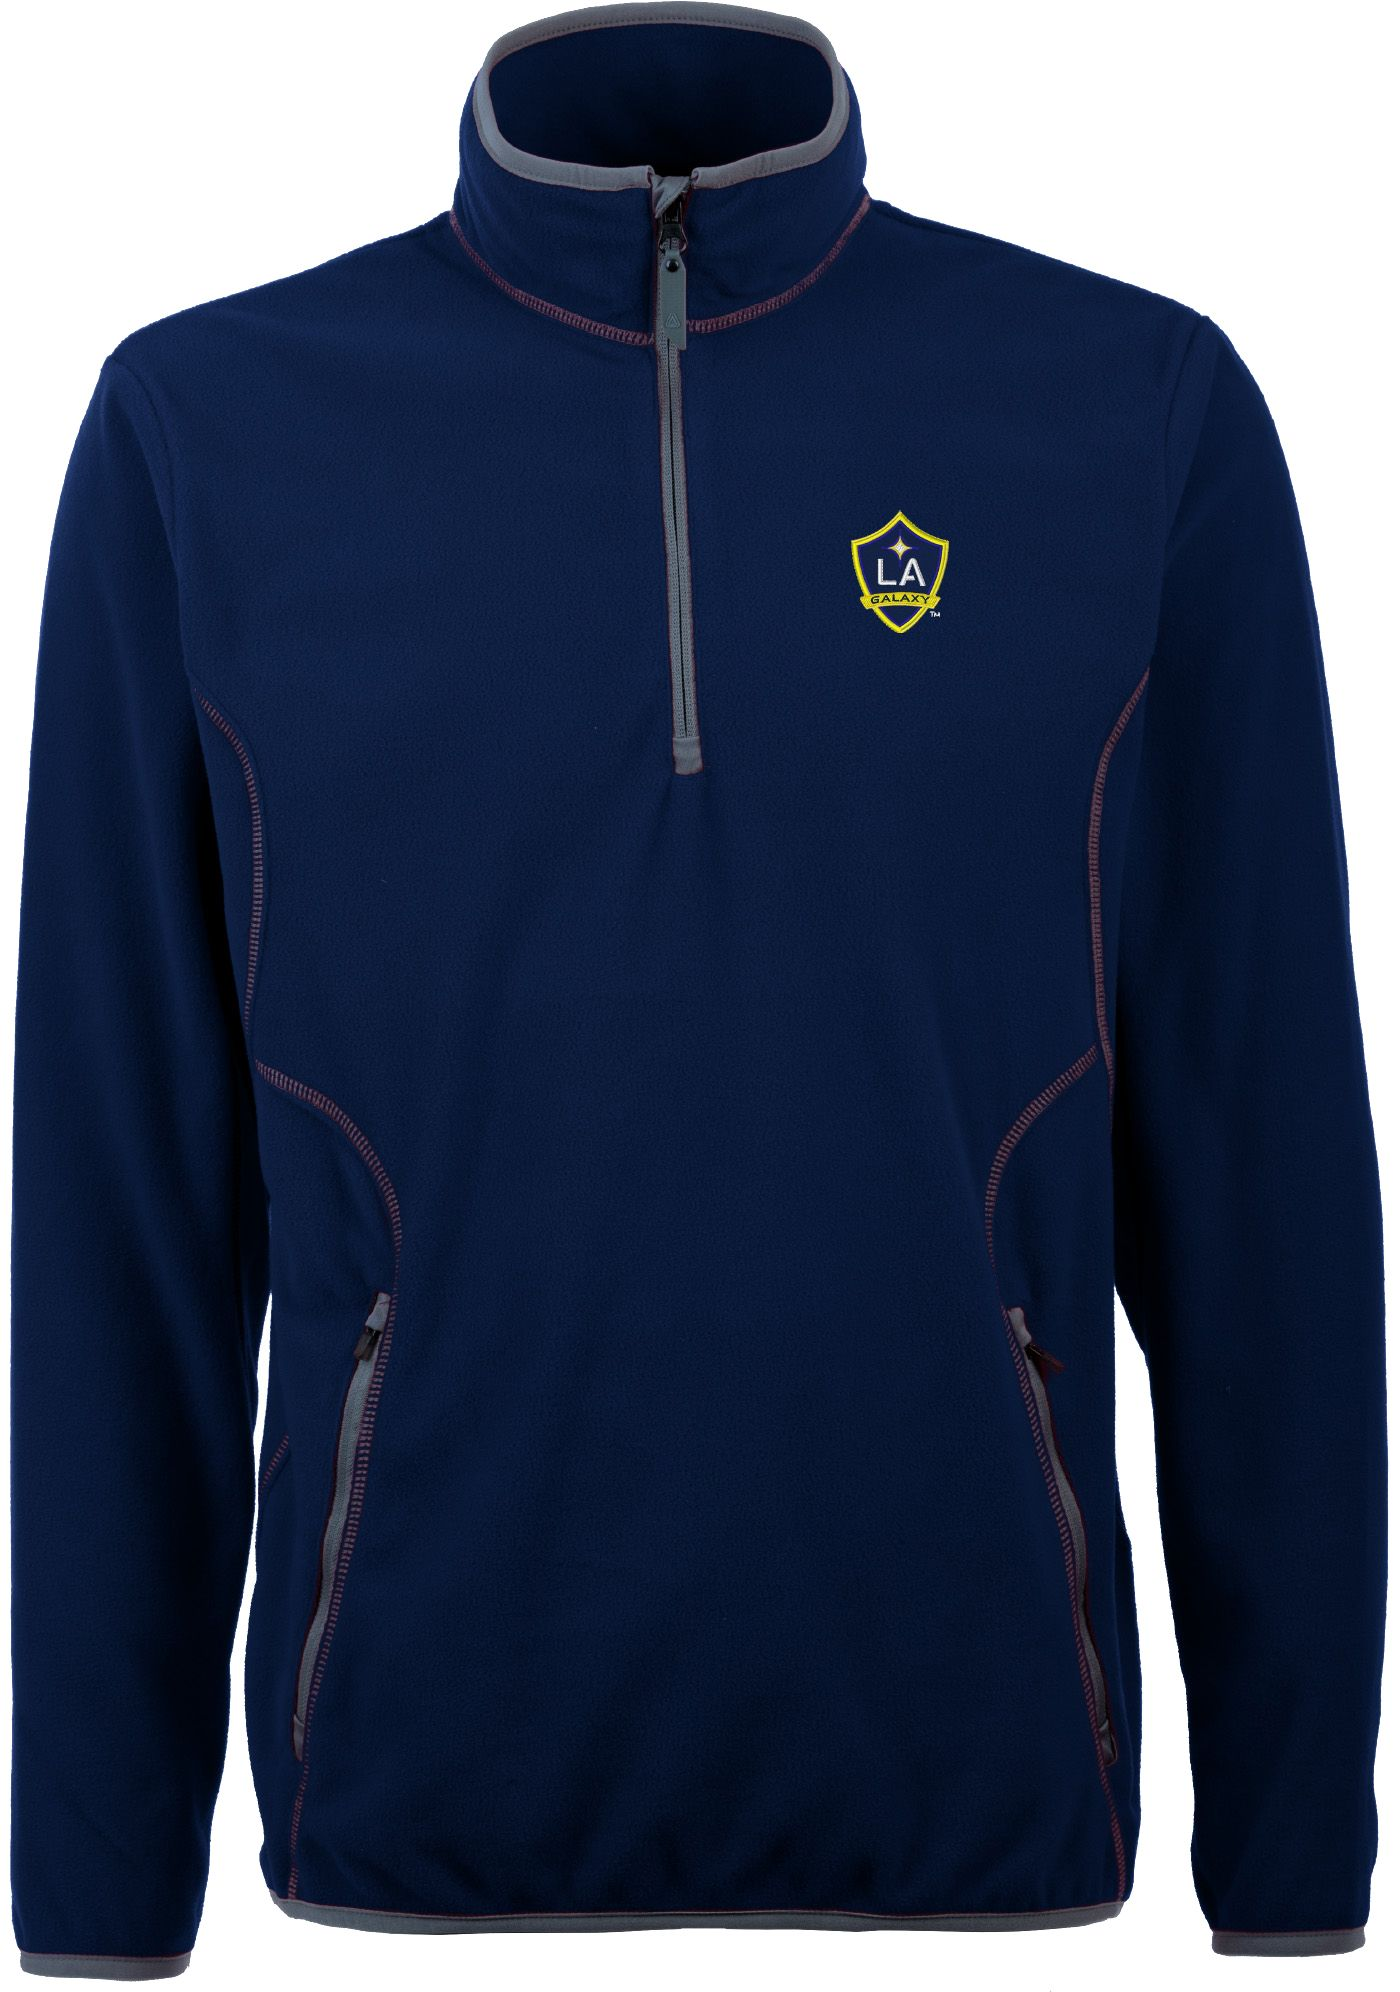 Antigua Men's Los Angeles Galaxy Ice Navy Quarter-Zip Fleece Jacket